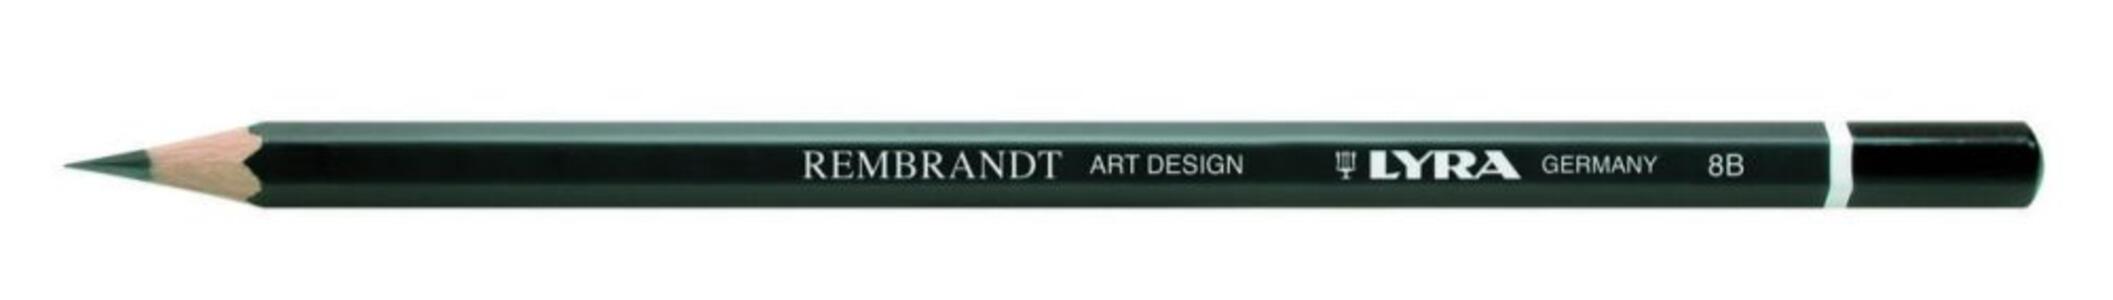 Matita Lyra Rembrandt Art Design - gradazione 8B